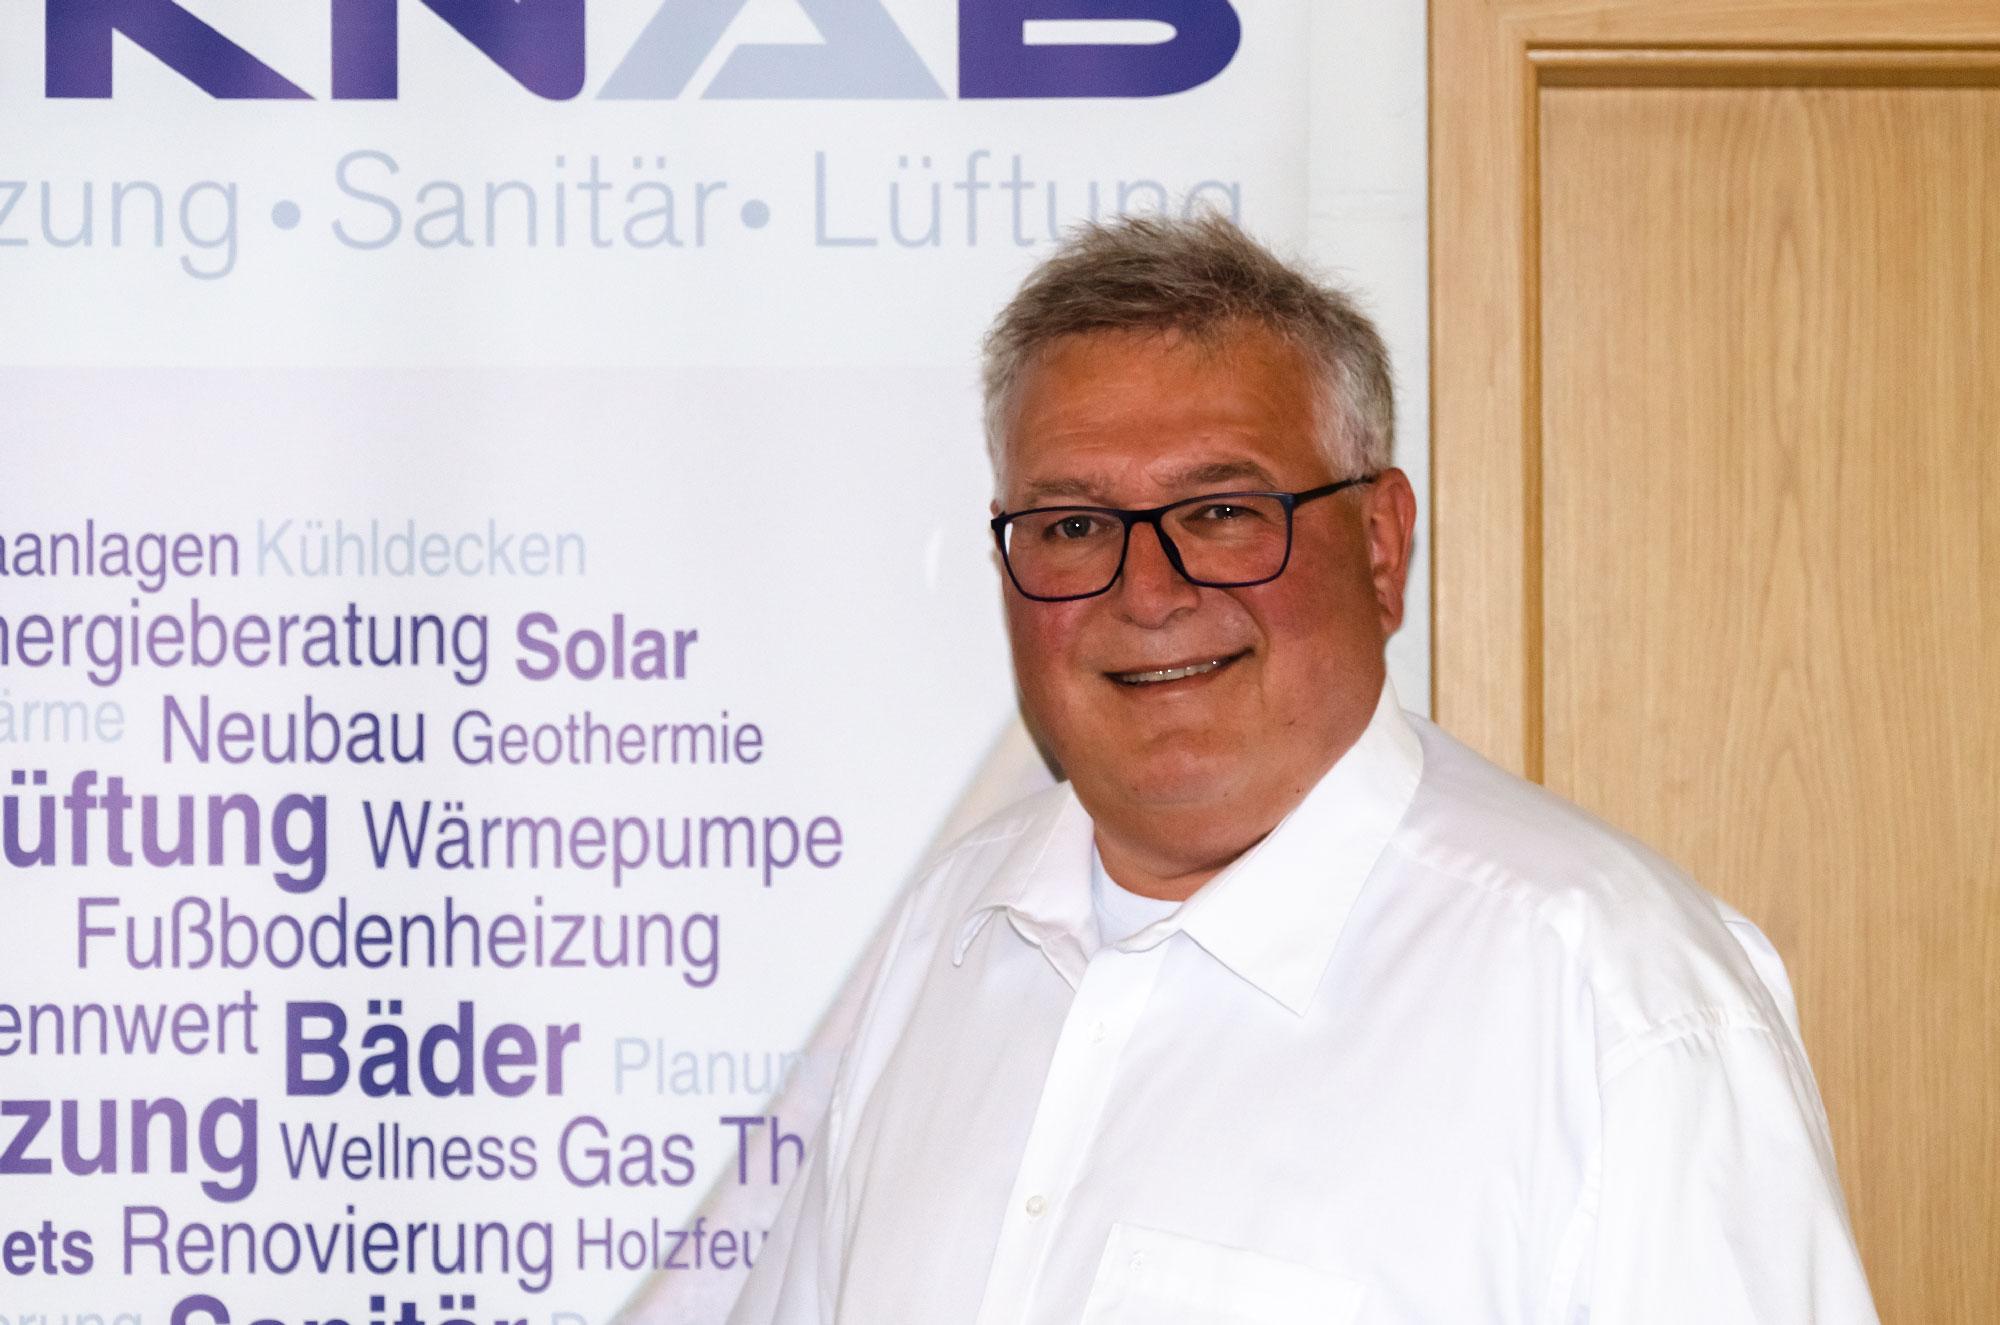 Matthias Knab